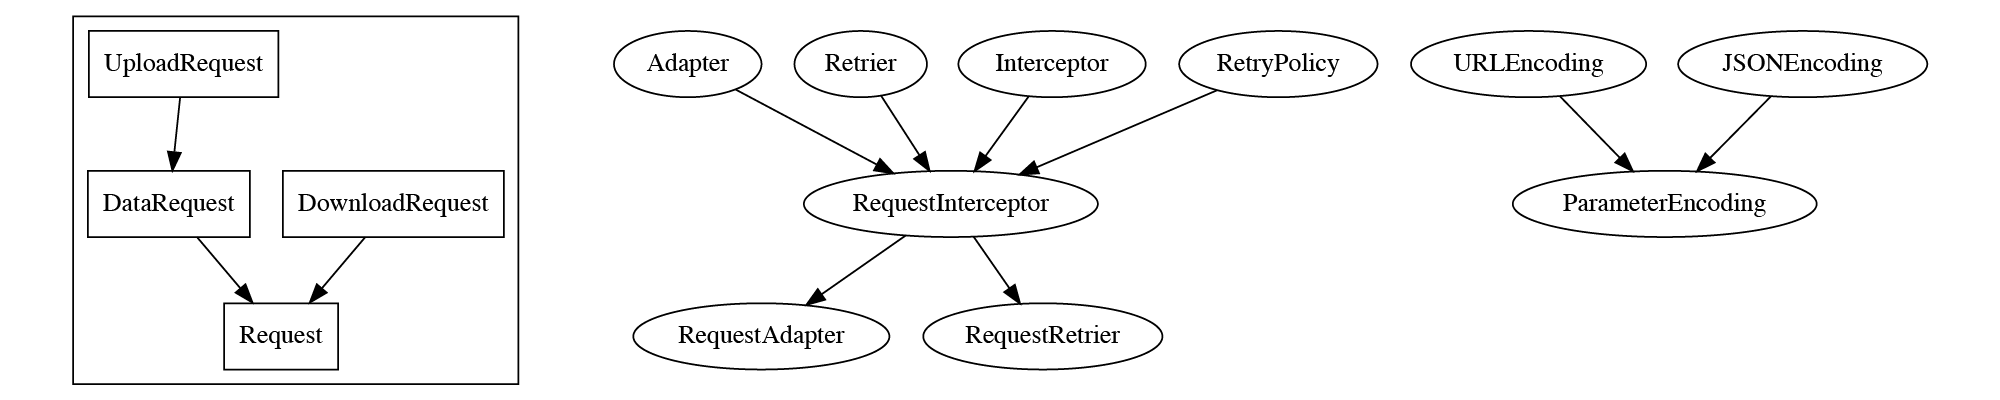 Excerpt of swift-doc-api Diagram for Alamofire